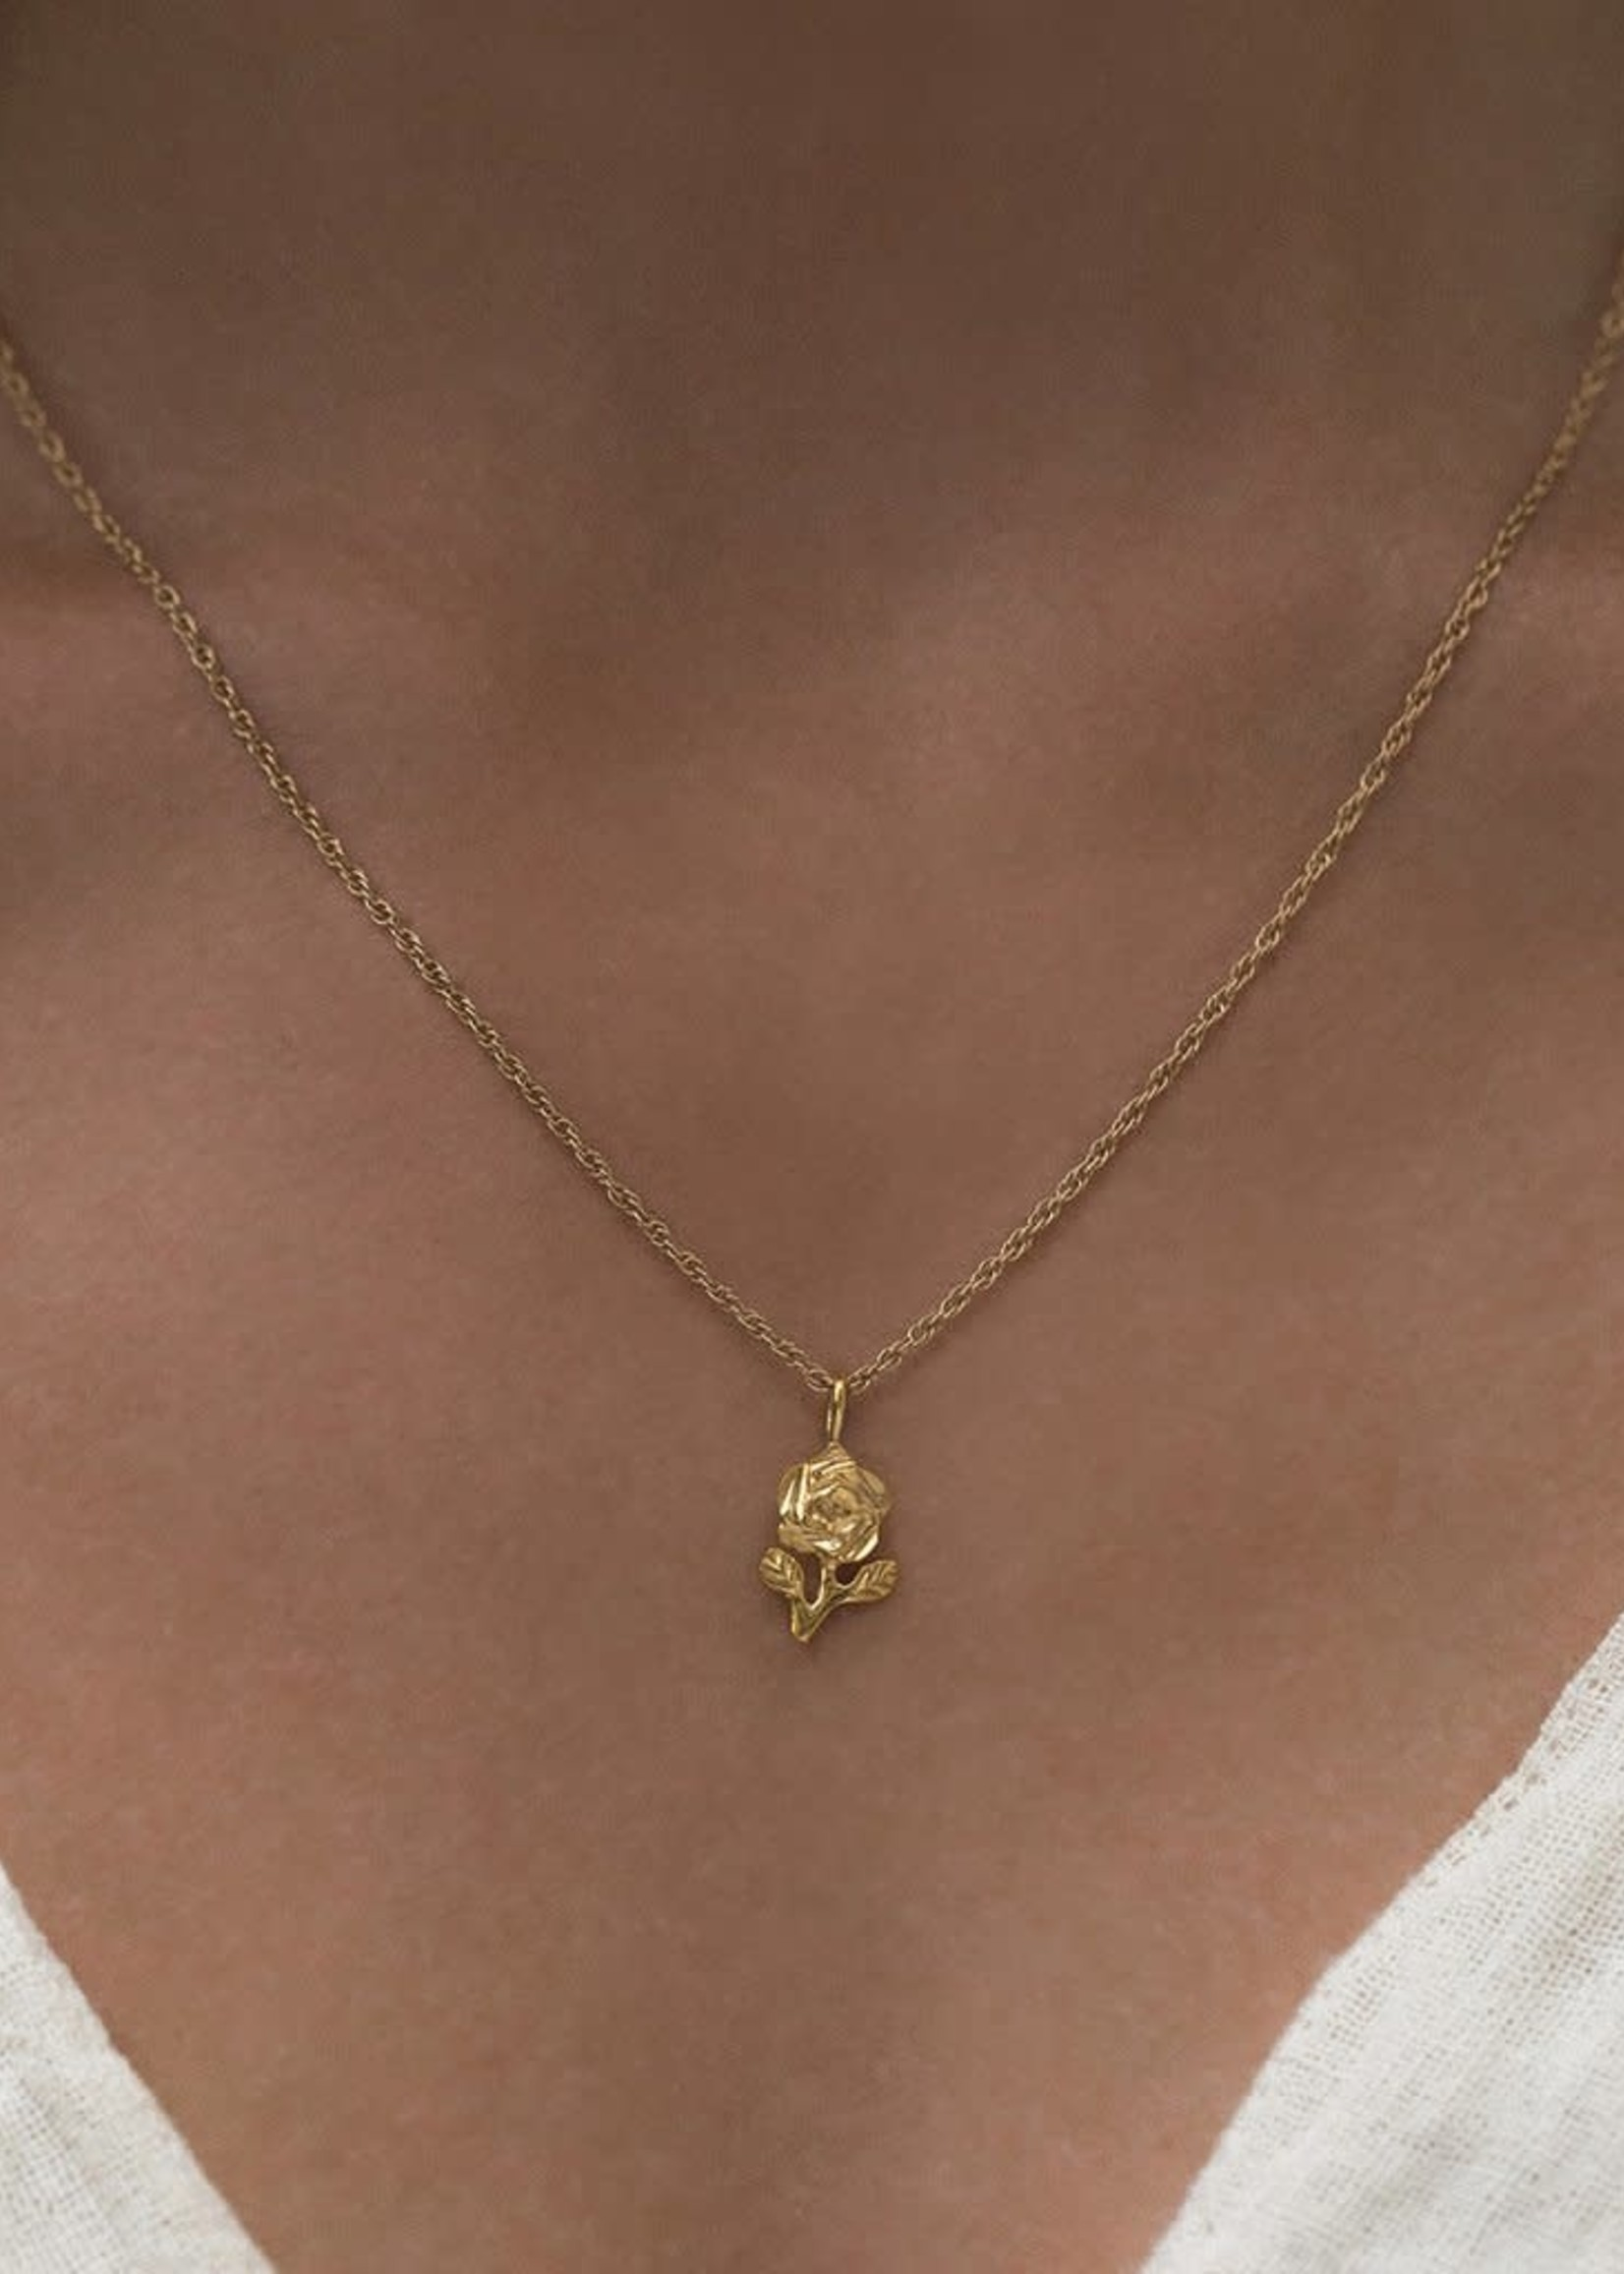 LEAH ALEXANDRA ROSE necklace